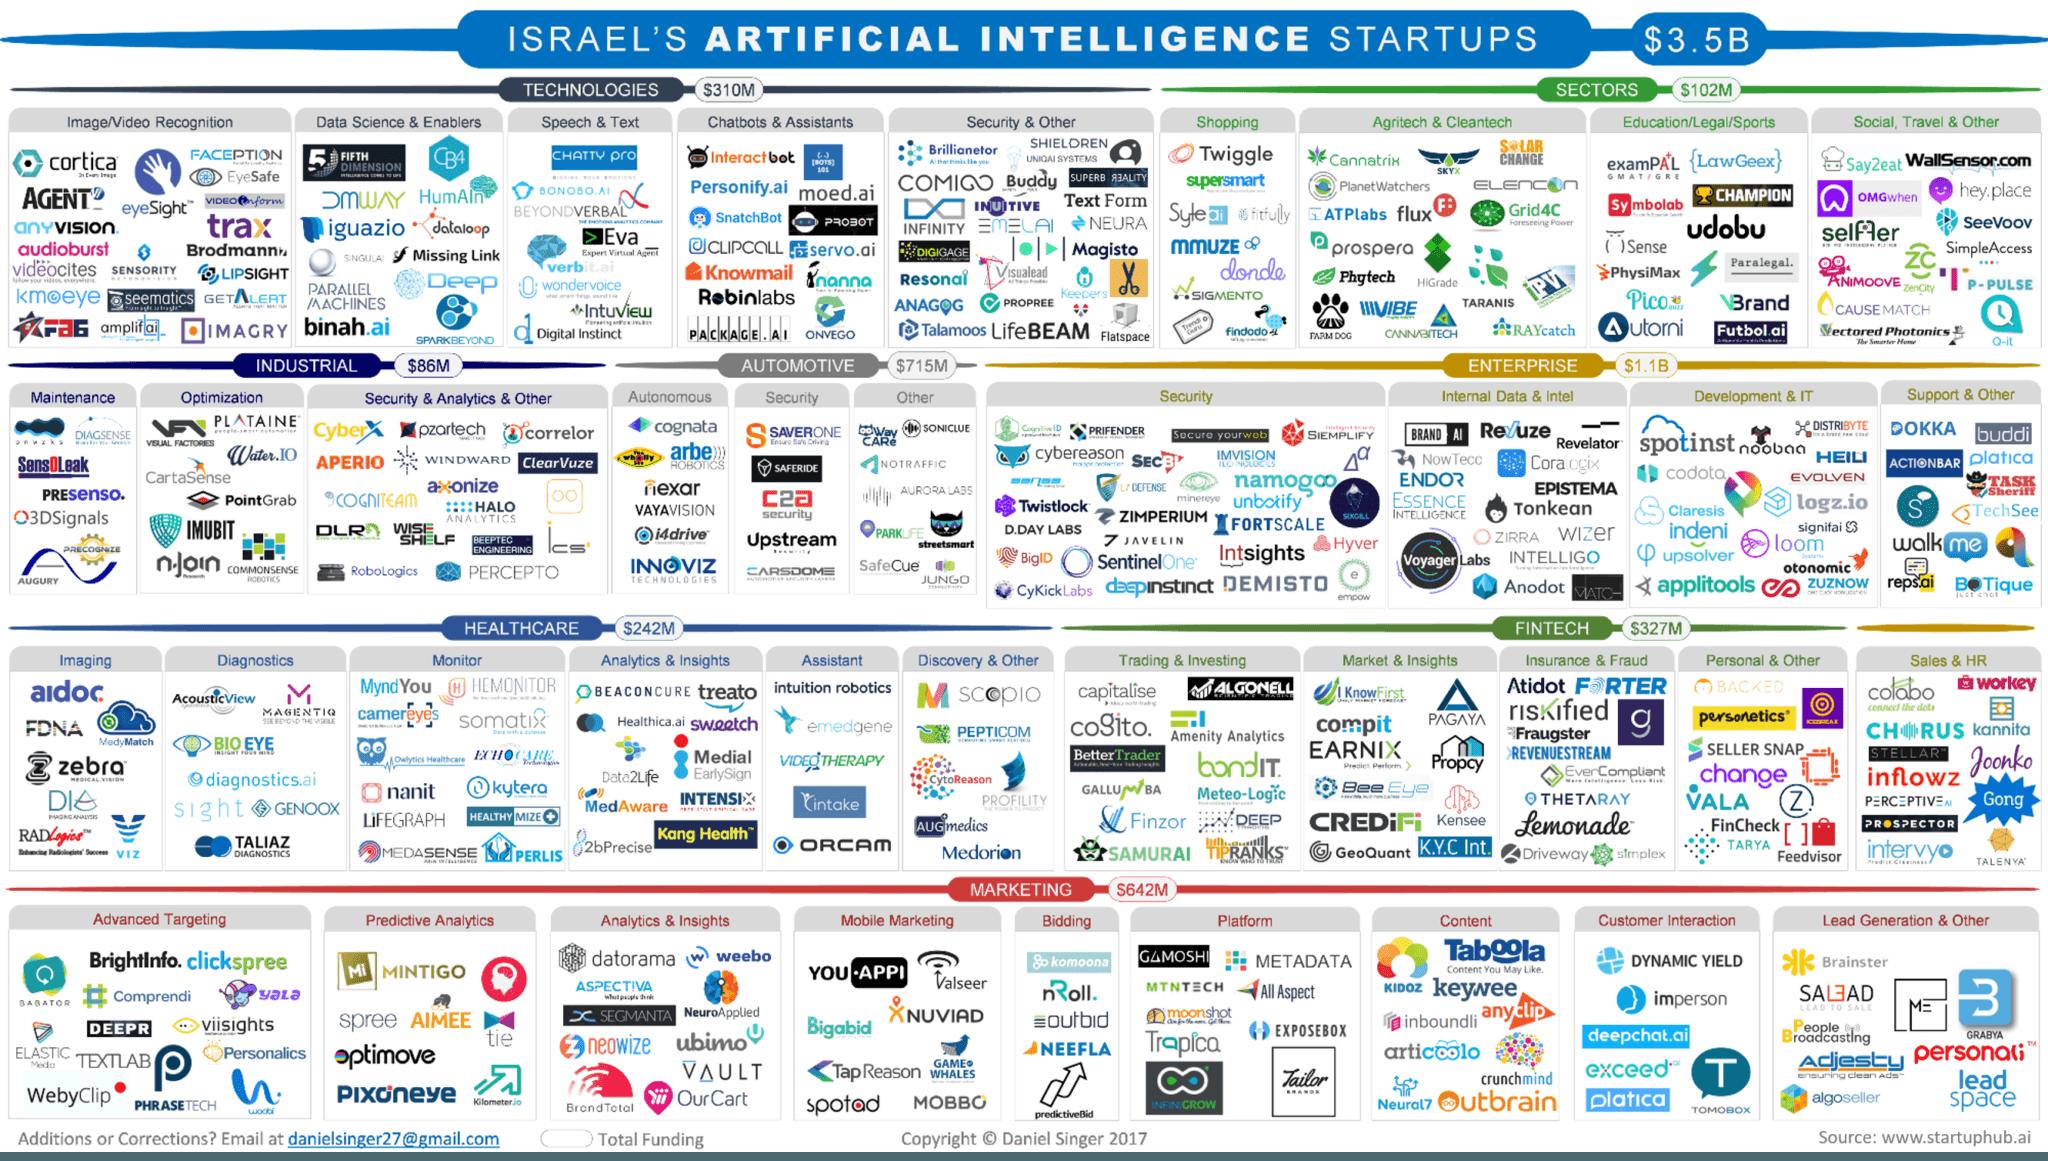 Israel's Artificial Intelligence Startups 2017